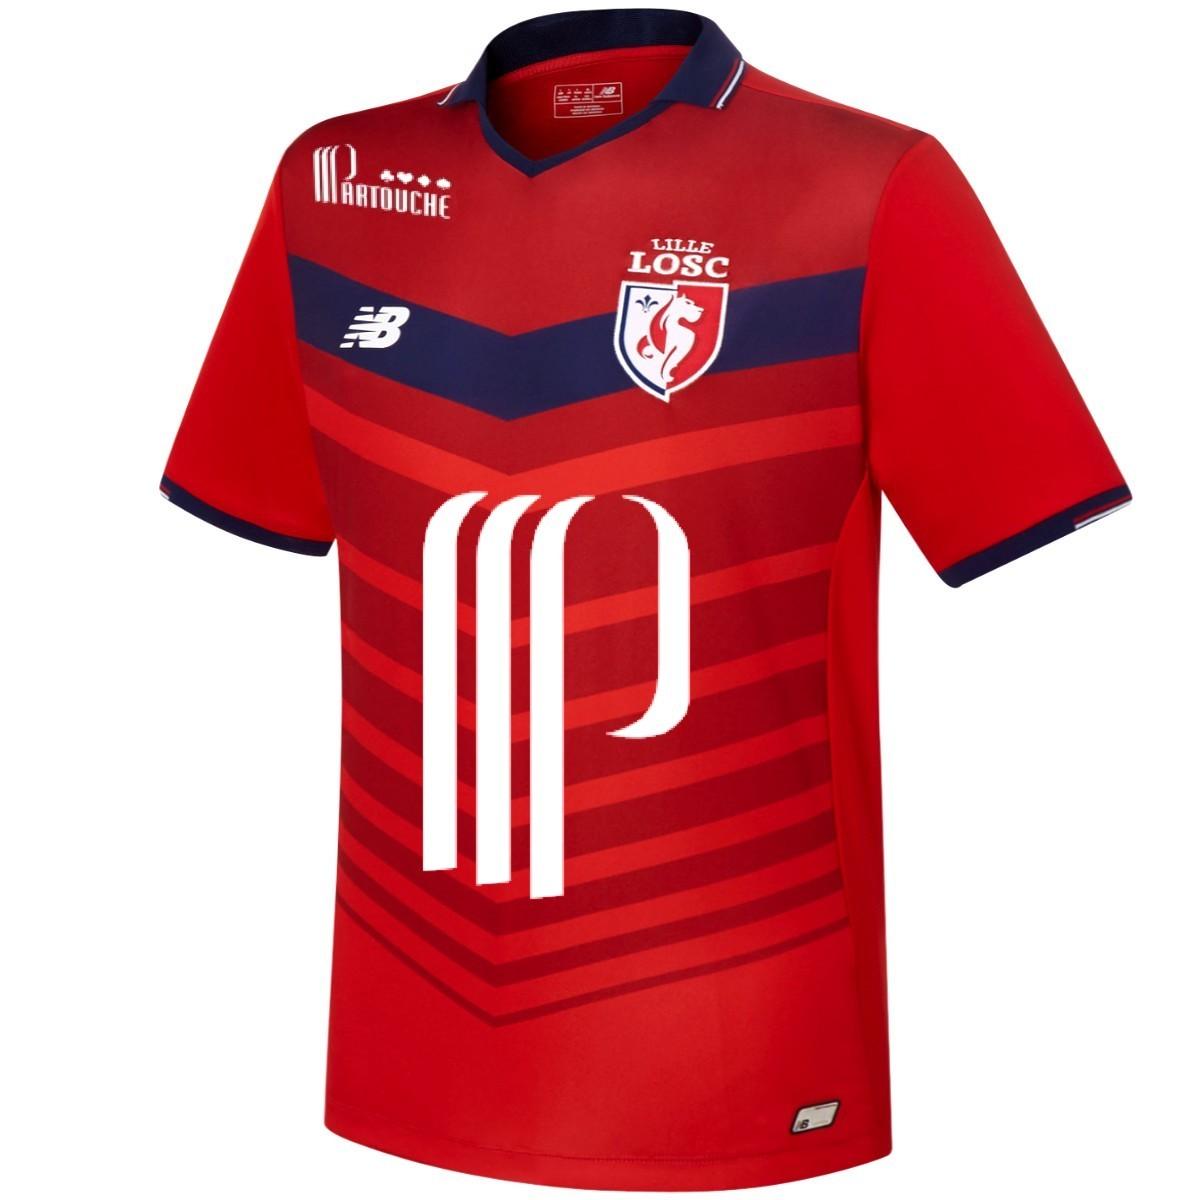 LOSC Lille Away football shirt 2016/17 - New Balance - SportingPlus.net